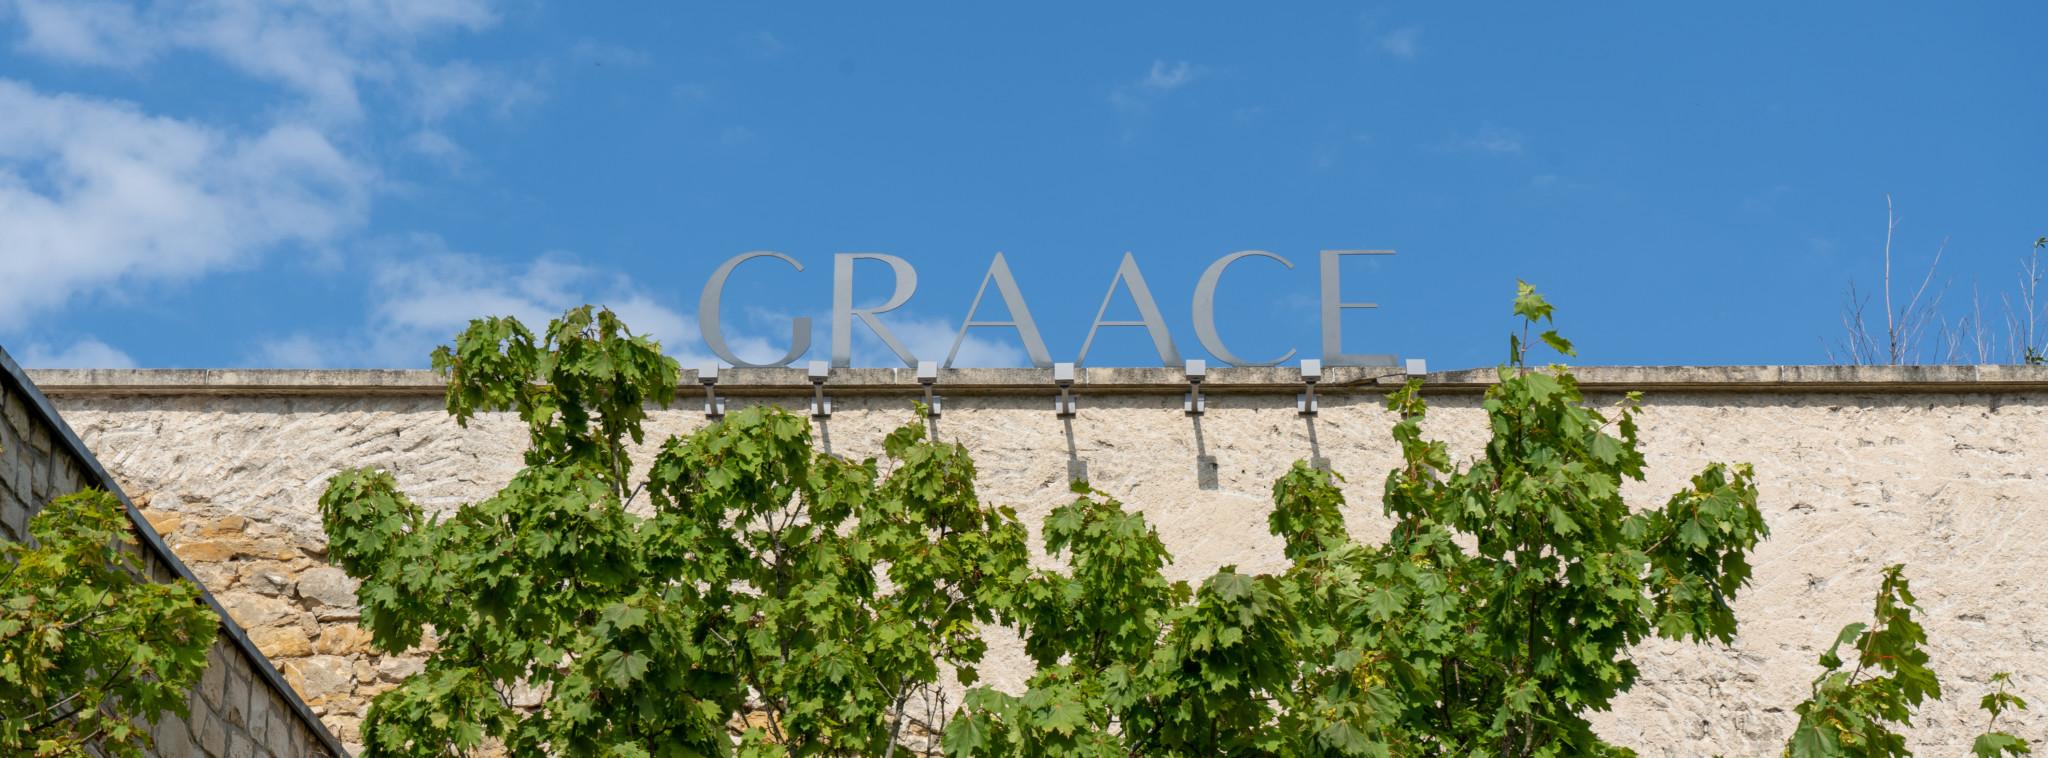 Graace Hotel Luxemburg